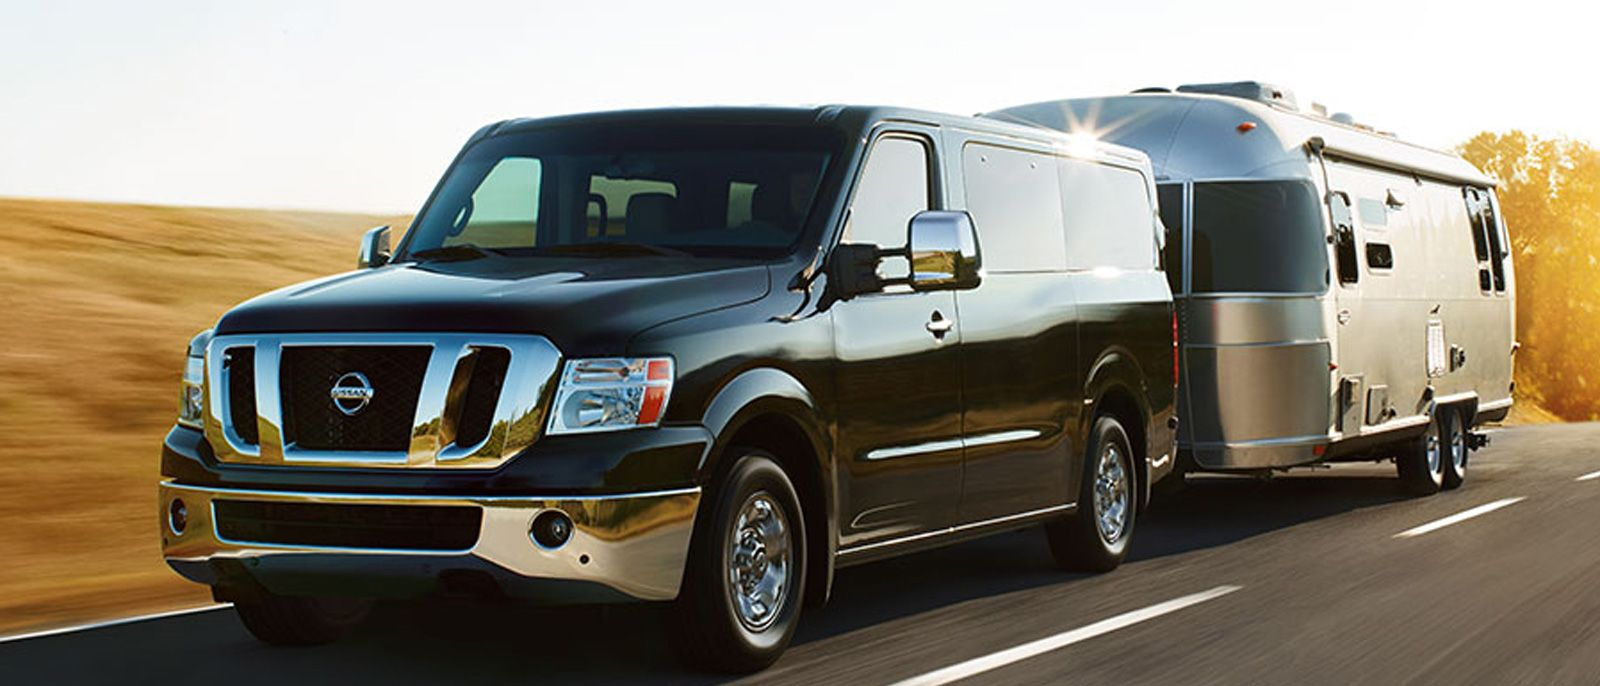 Nissan nv cargo vans cars i love pinterest cargo van nissan and commercial vehicle